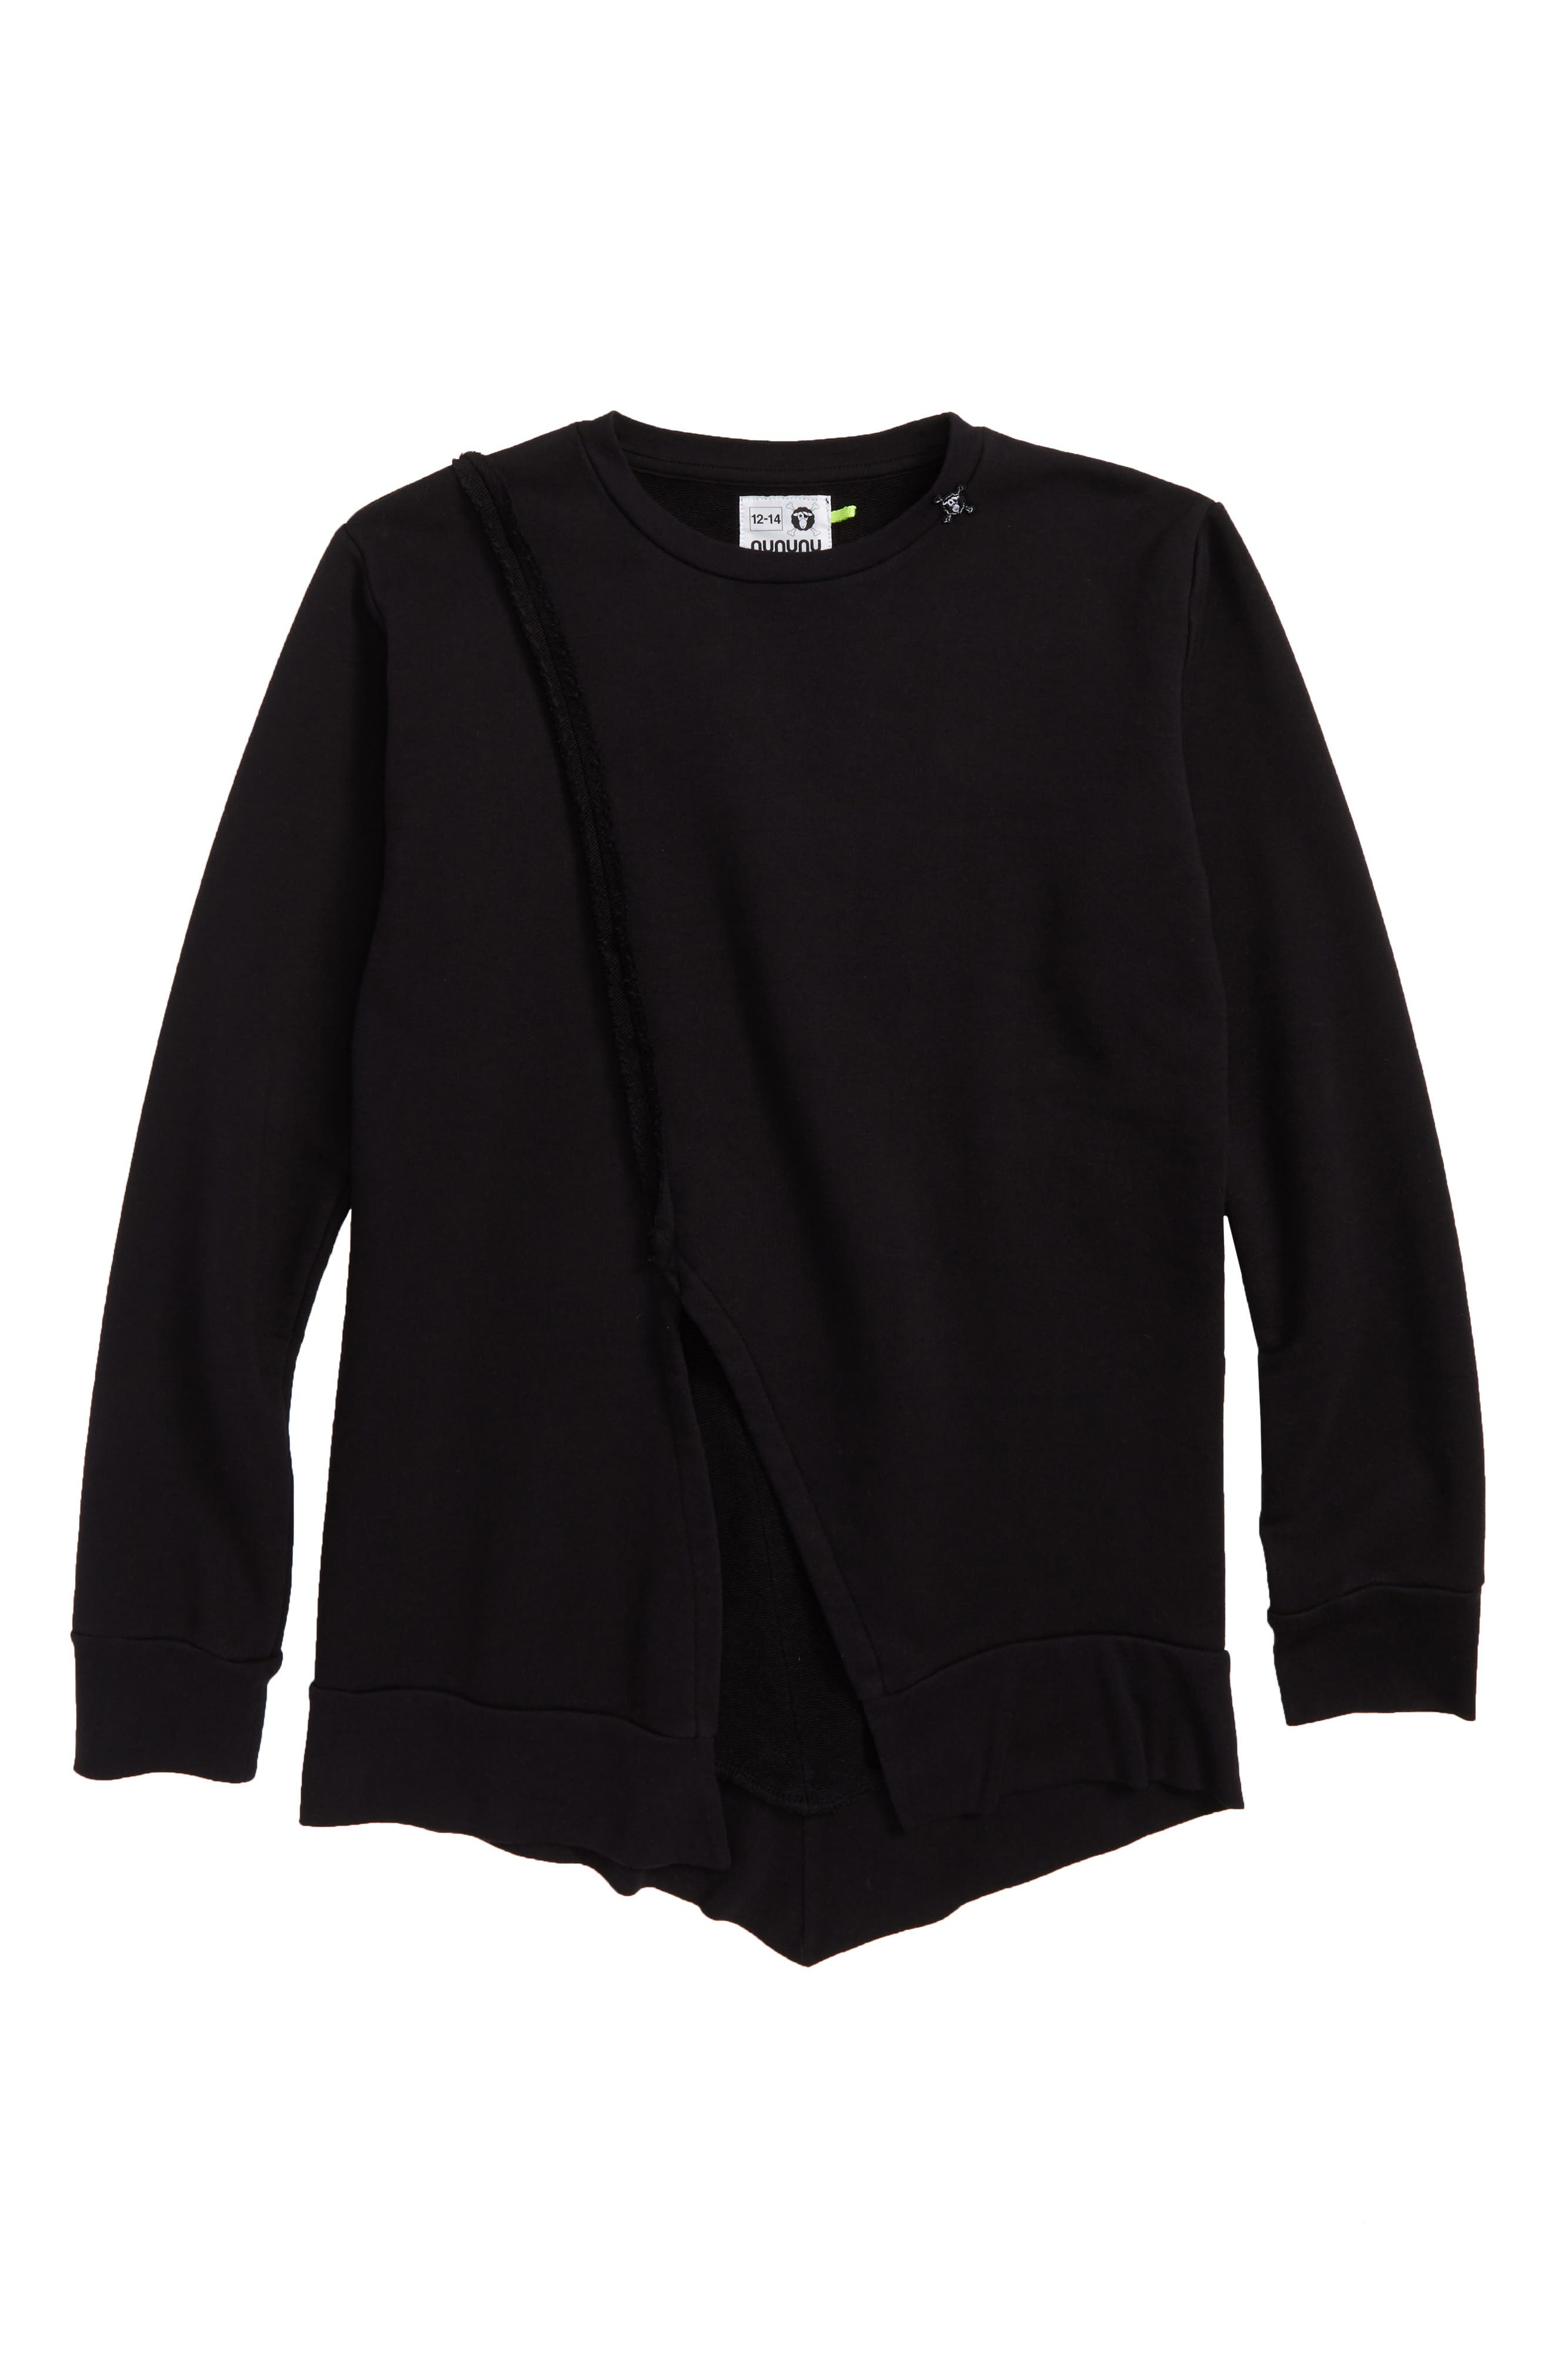 Penguin Sweatshirt,                             Main thumbnail 1, color,                             BLACK